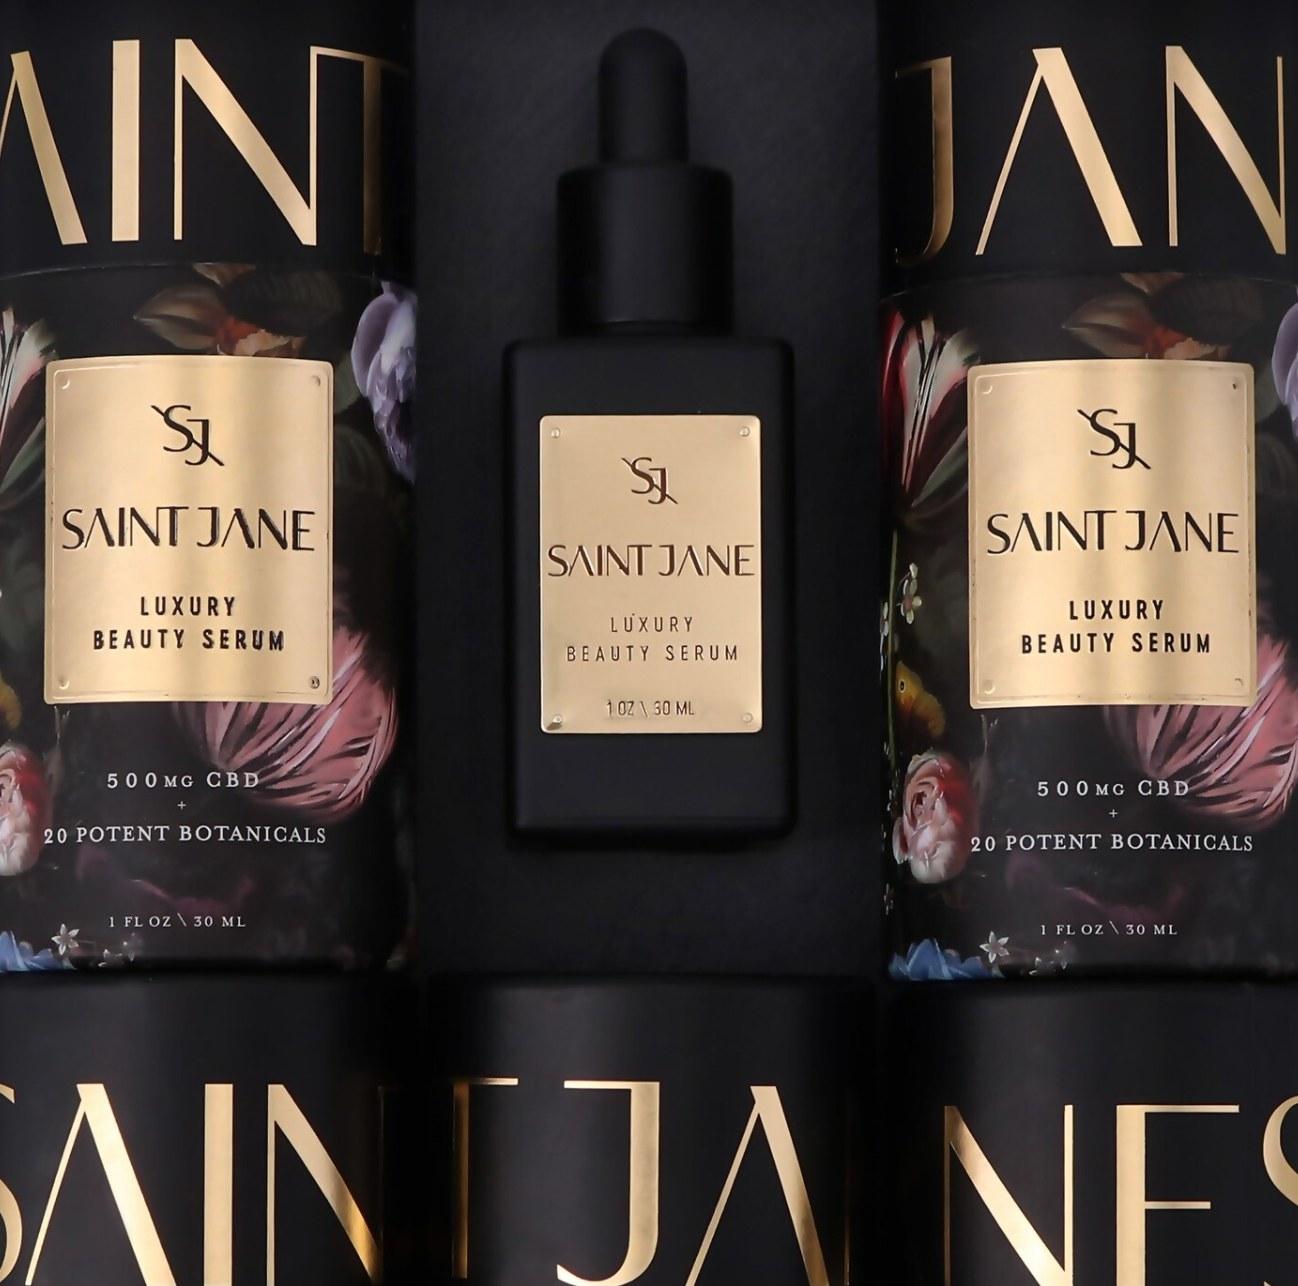 Bottle of Saint Jane serum and packaging